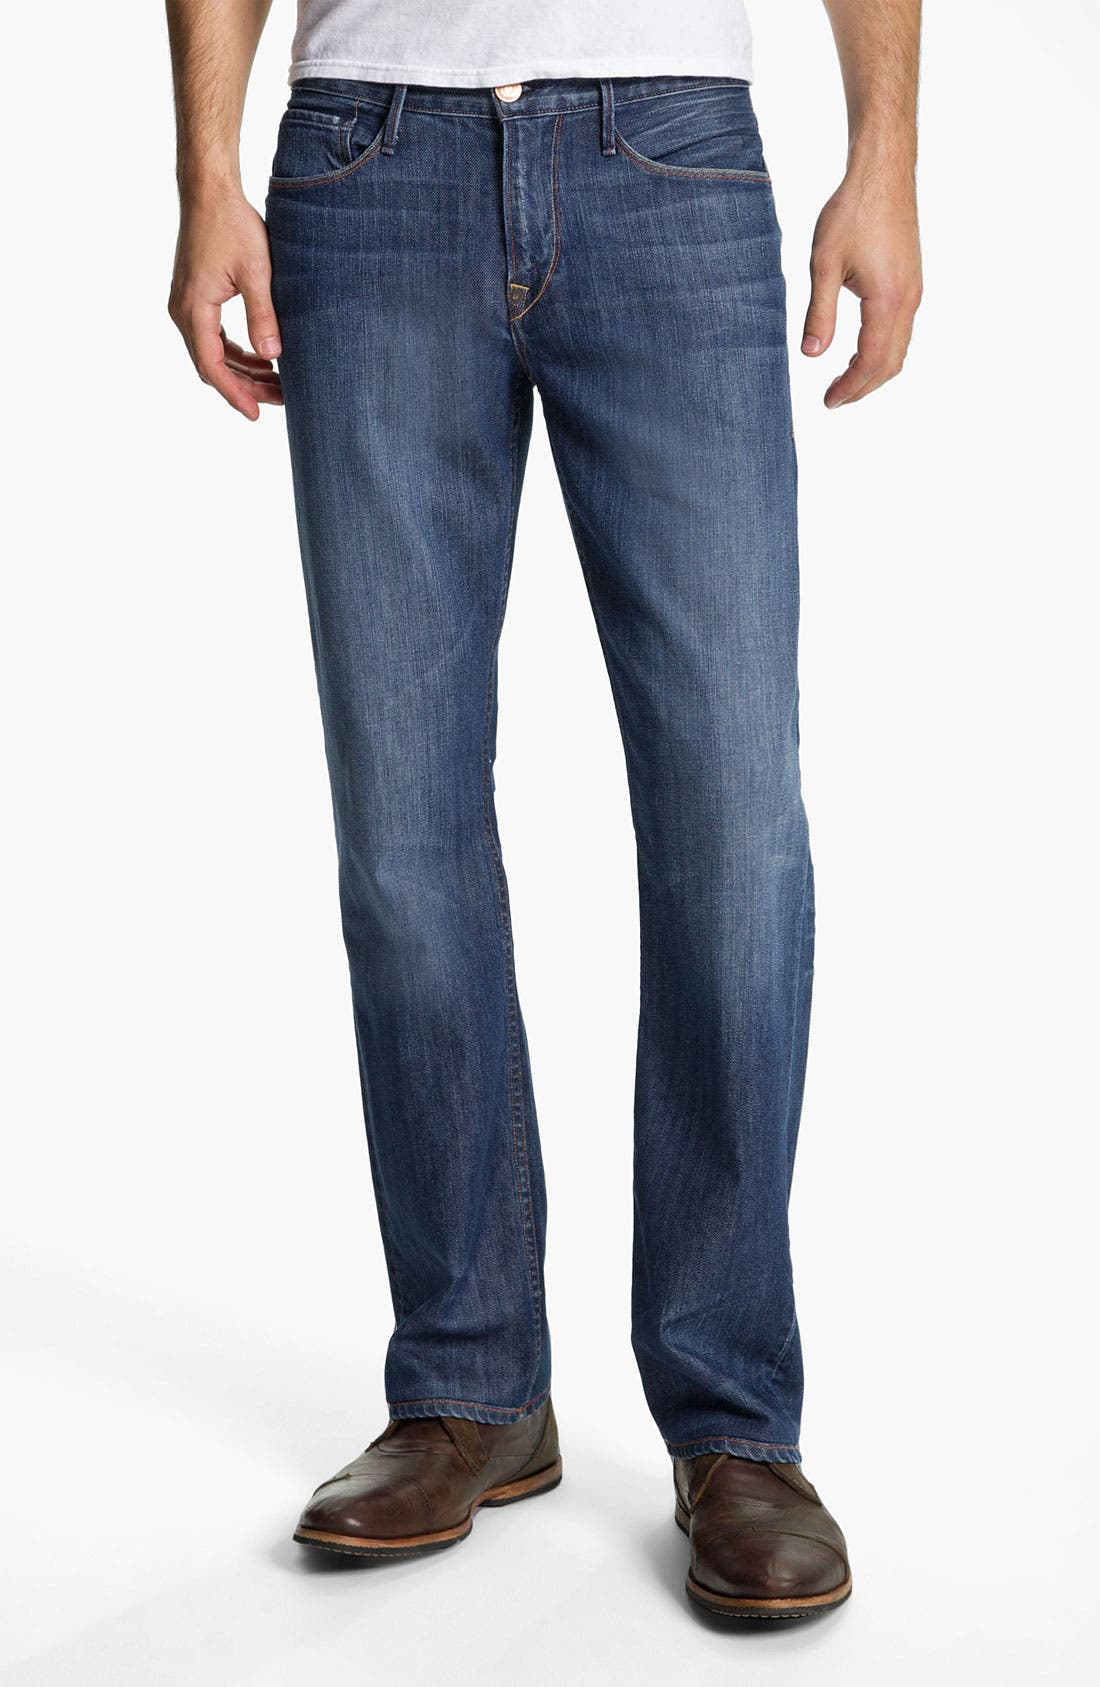 Main Image - Earnest Sewn 'Dexter' Relaxed Leg Jeans (Burton)